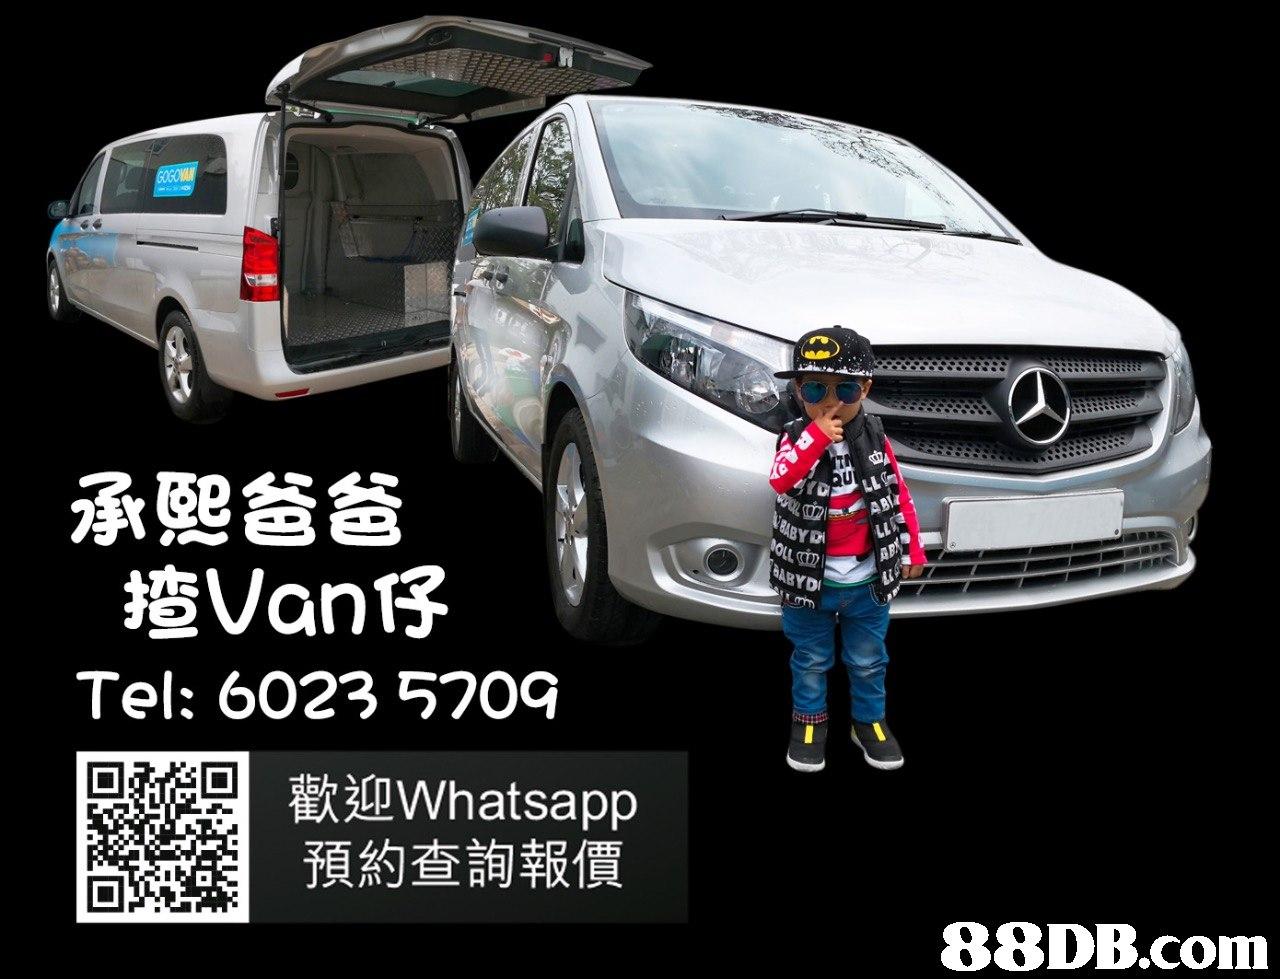 承熙爸爸 BYD Tel: 6023 570g 歡迎Whatsapp 預約查詢報價   Vehicle,Car,Motor vehicle,Transport,Mercedes-benz